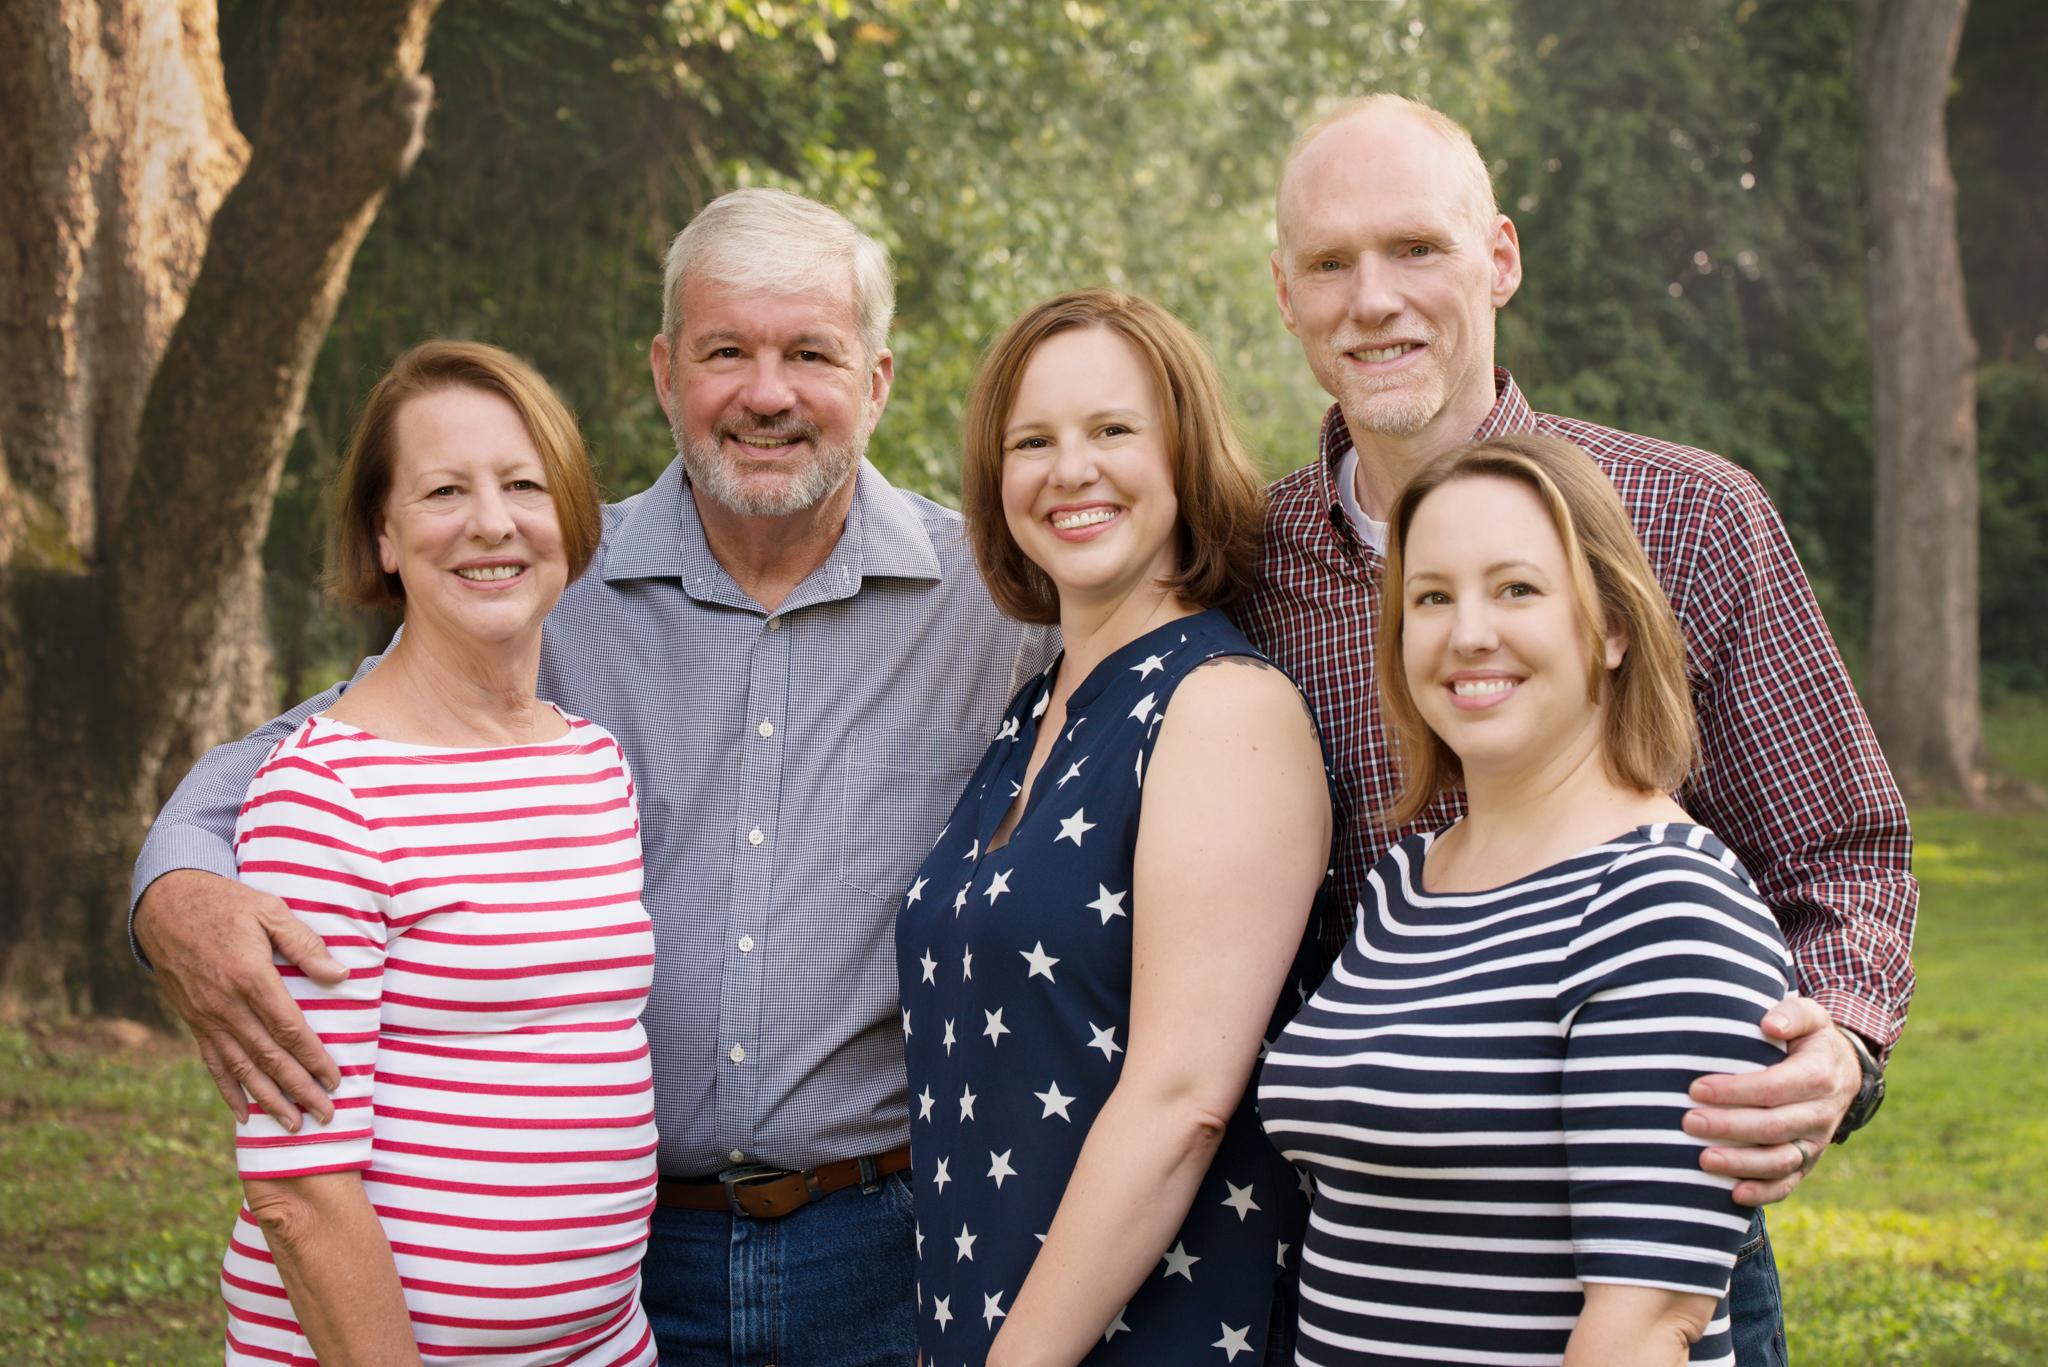 peachtree city family photographer-4.jpg